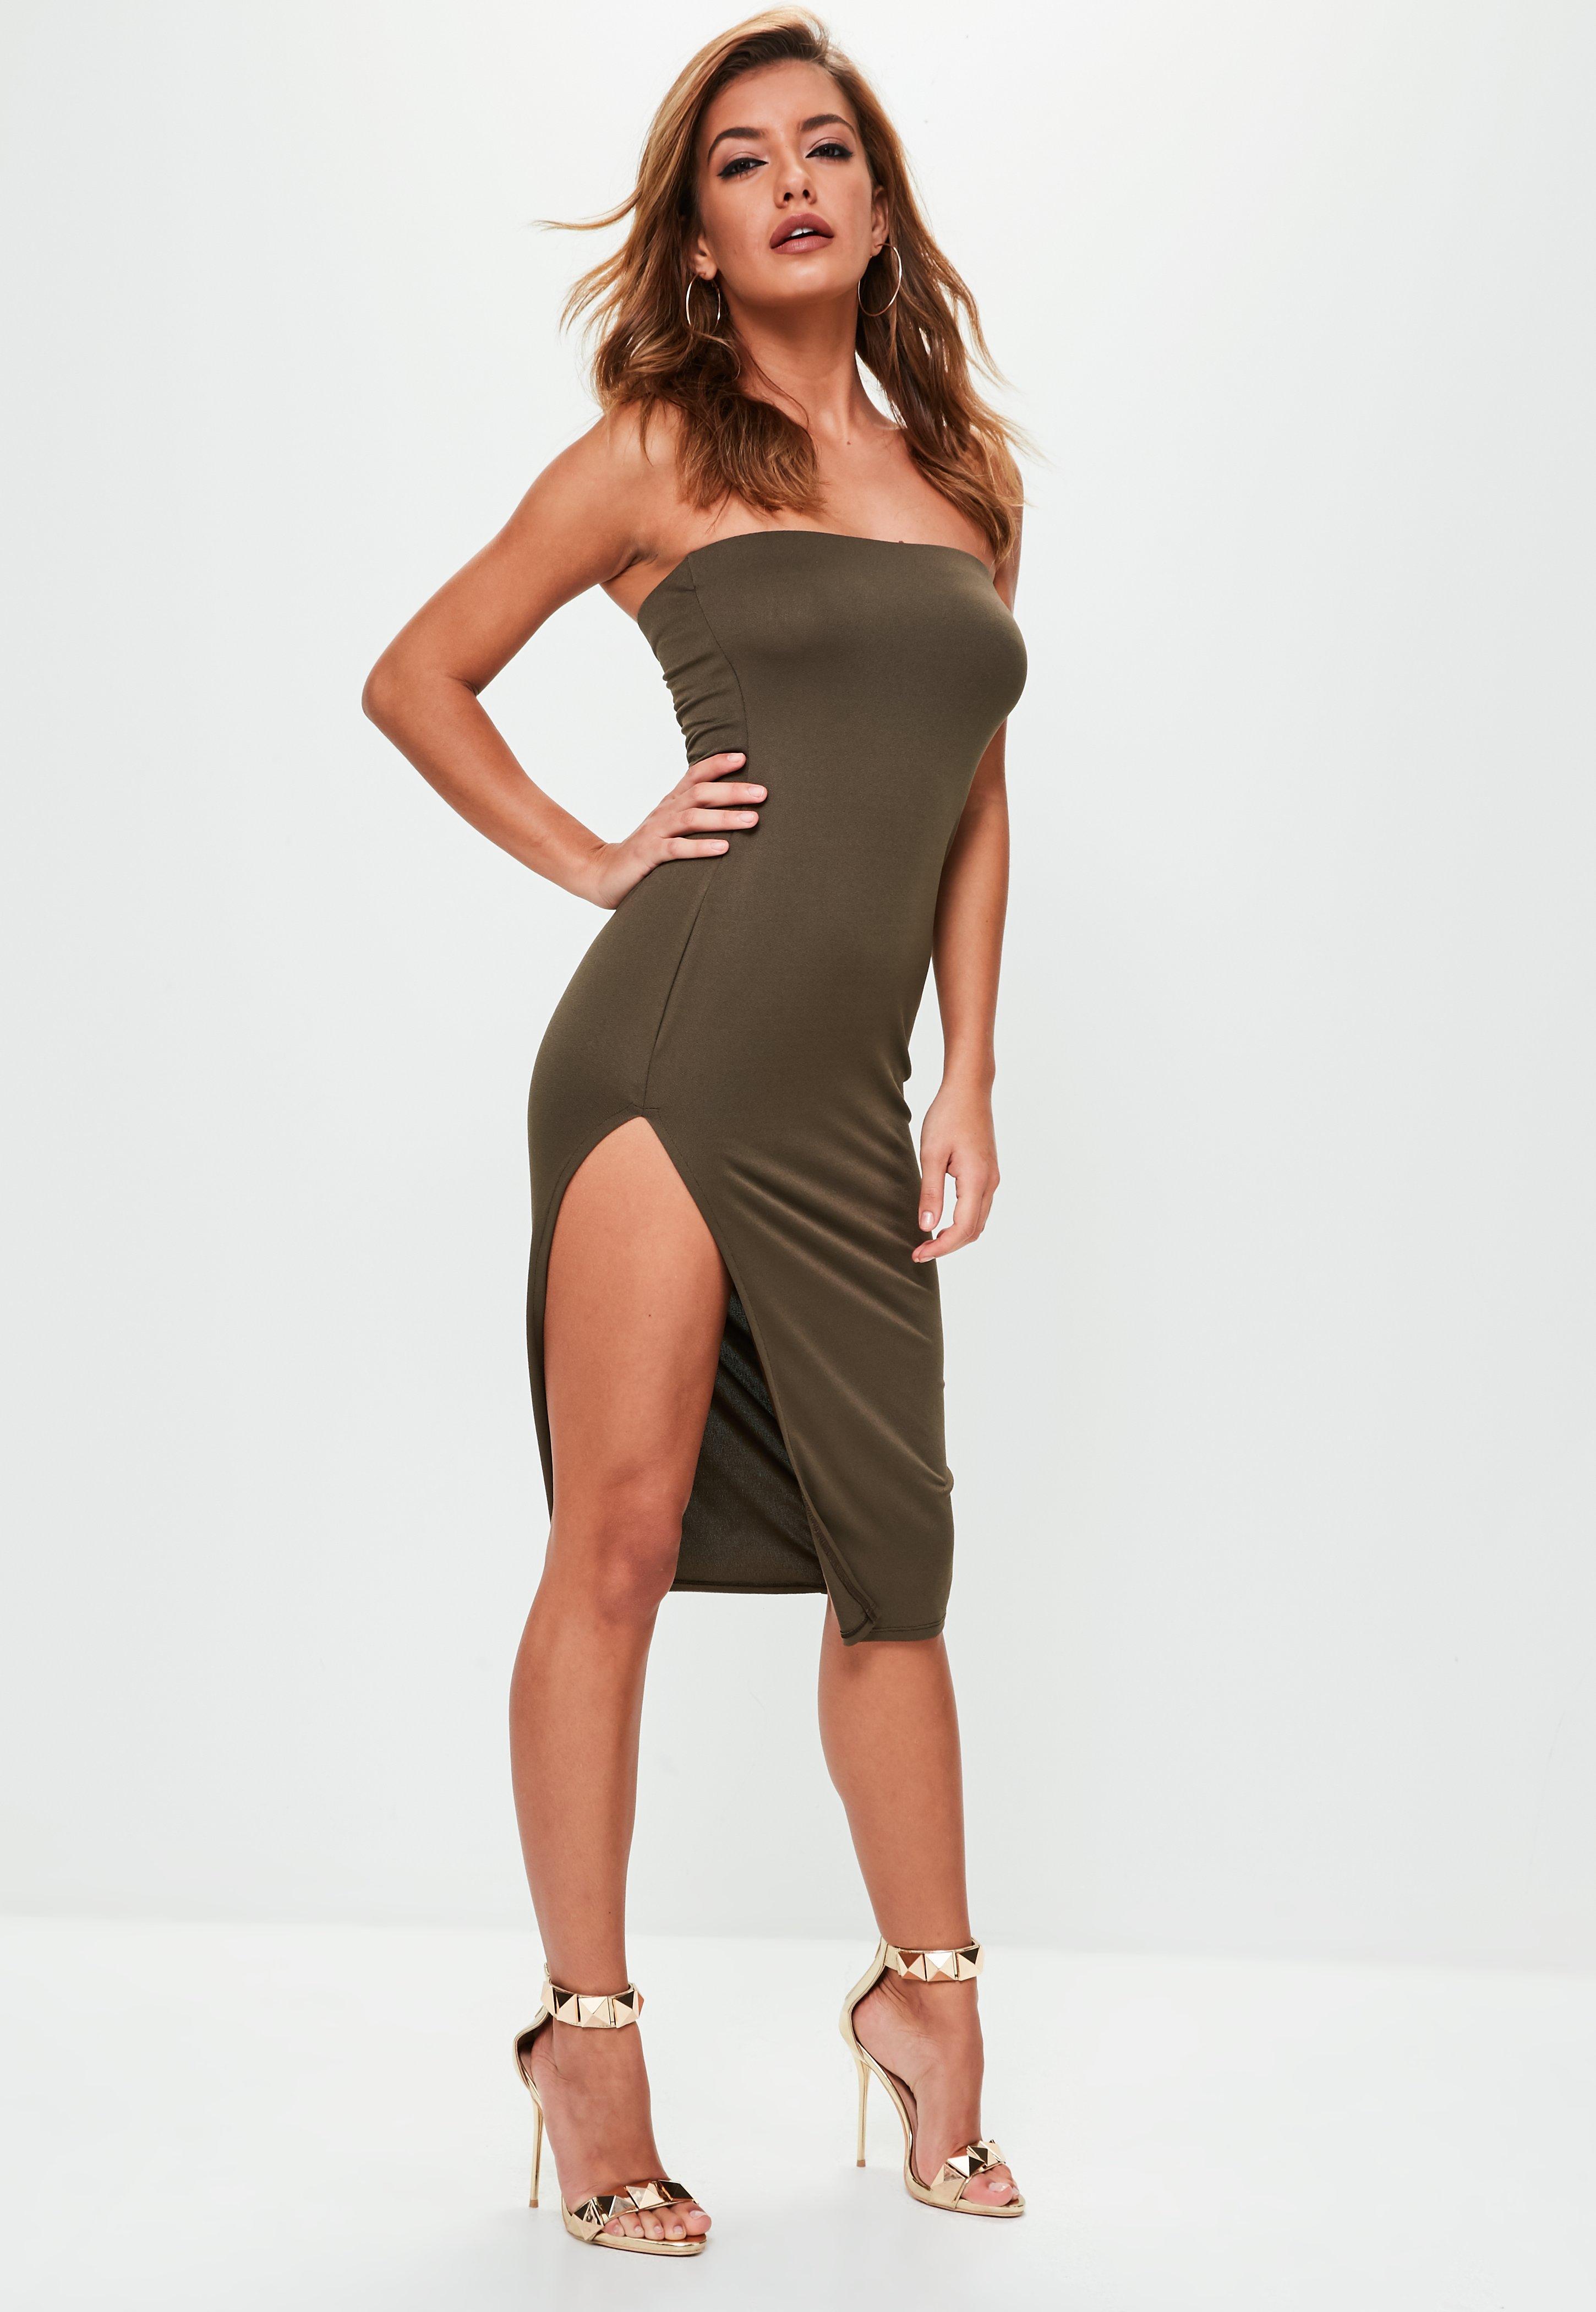 Missguided Khaki Crepe Split Side Bandeau Mini Dress in Natural - Lyst 51095d79e